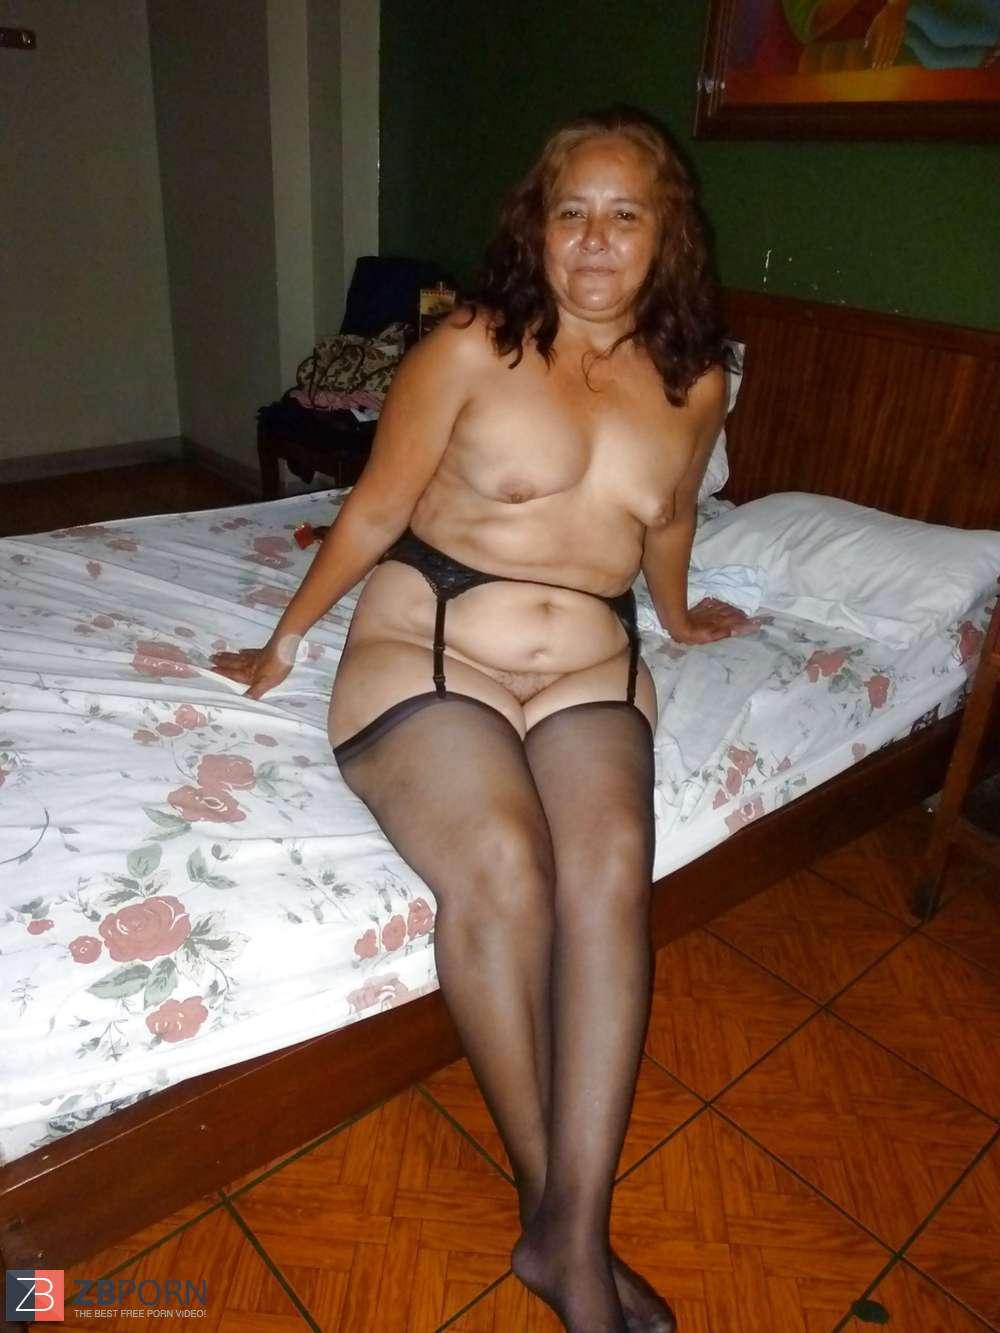 Abuelas Culonas Cojiendo puta = mi abuela es una puta (witness music flick too) / zb porn